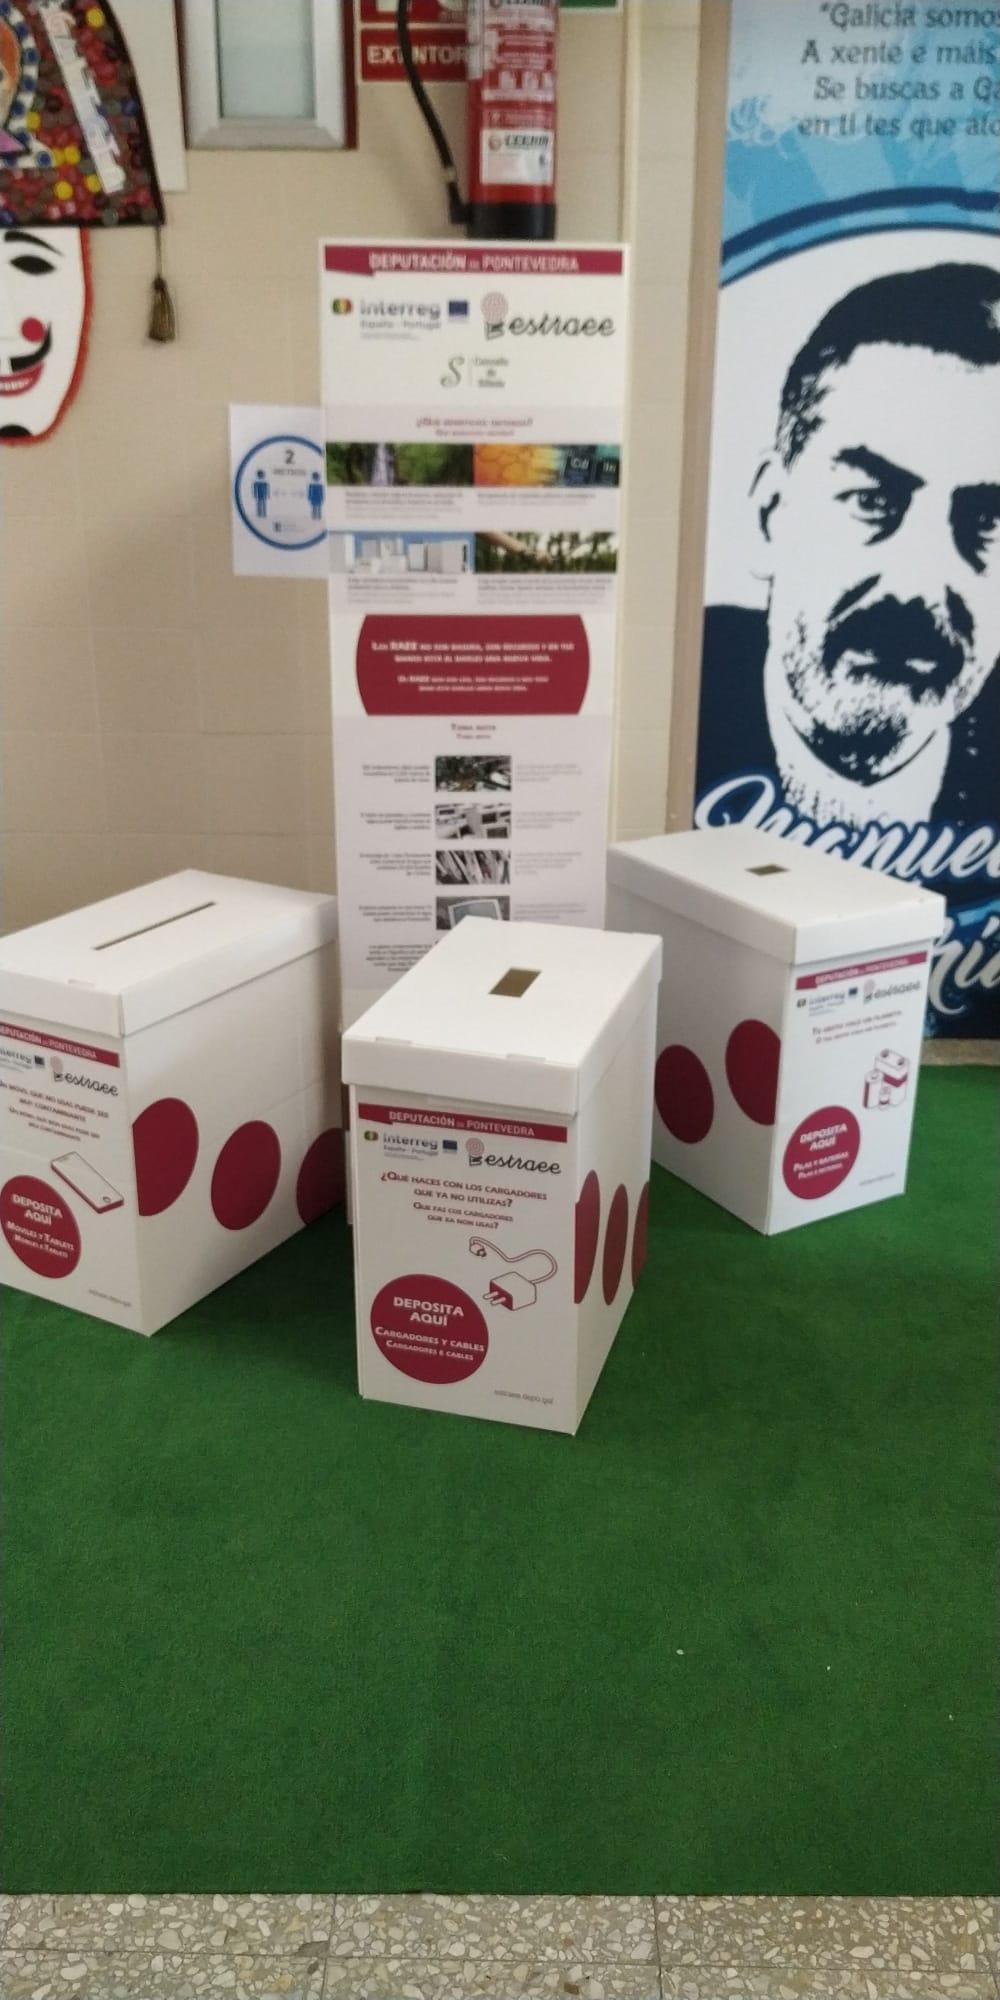 O Mini Eco Punto Limpo estará nos centros escolares do municipio a partir da vindeira semana